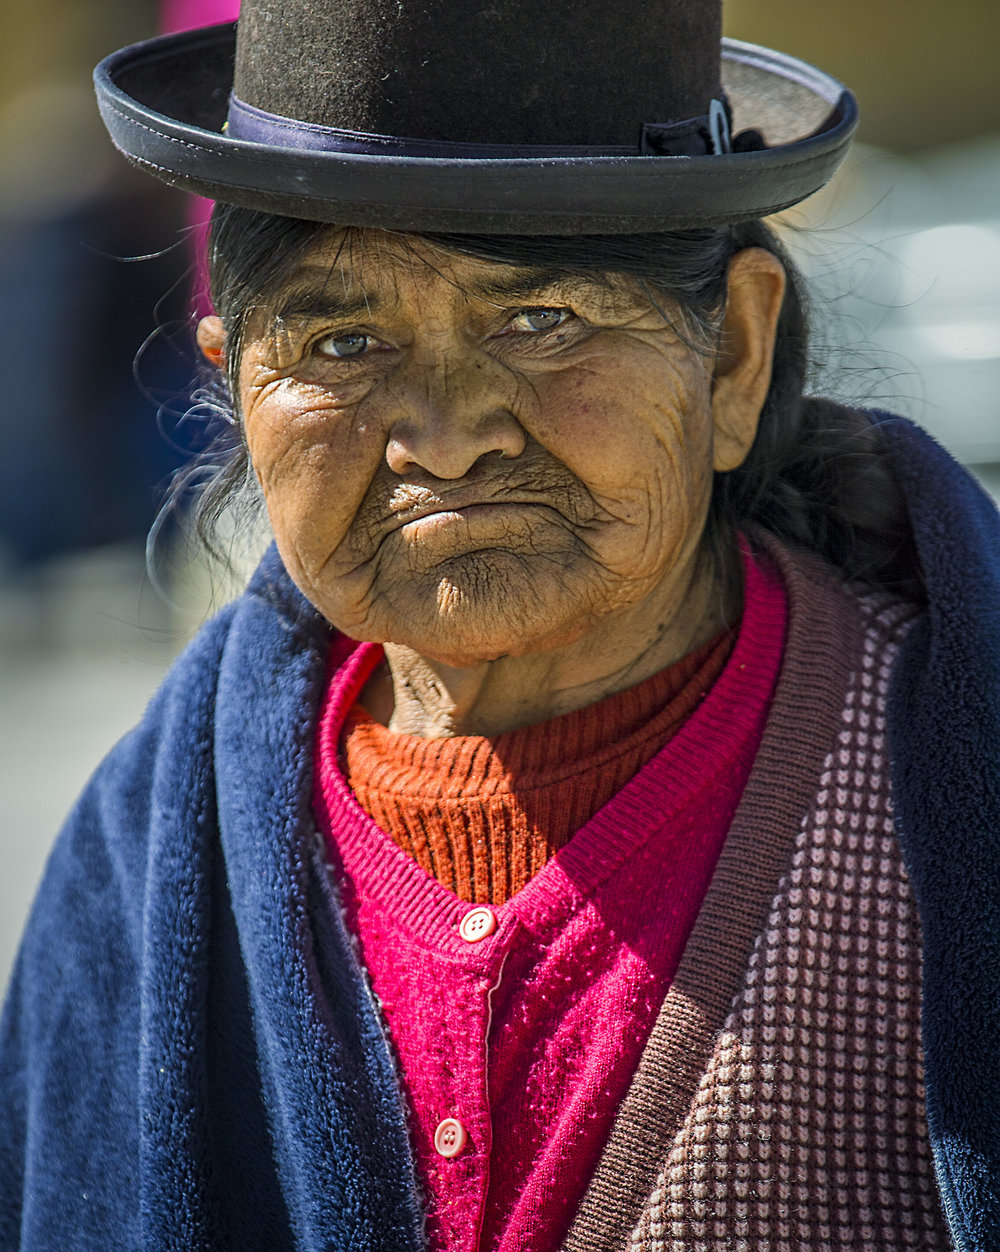 Simon+Needham+Photography+Humanitarian+Bolivia+23.jpg